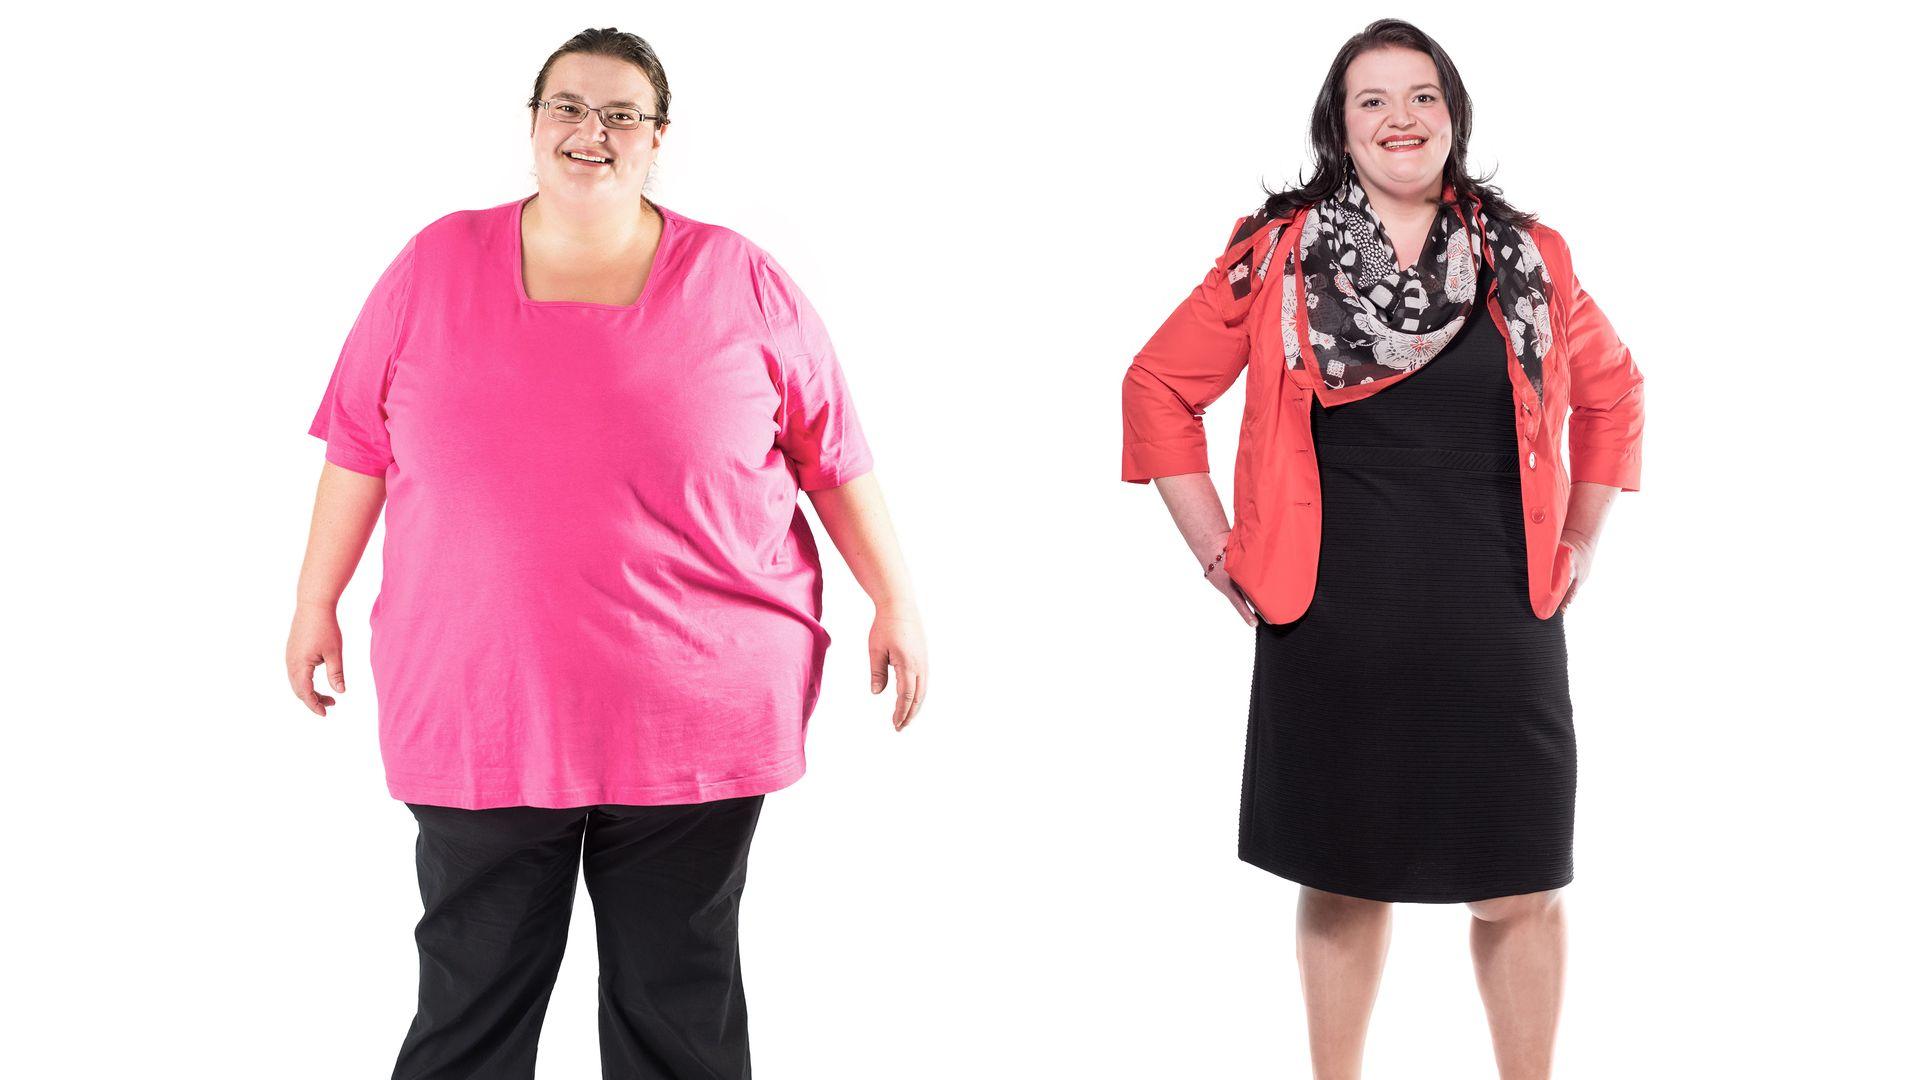 extrem schwer katrin wiegt jetzt 85 kilo weniger. Black Bedroom Furniture Sets. Home Design Ideas